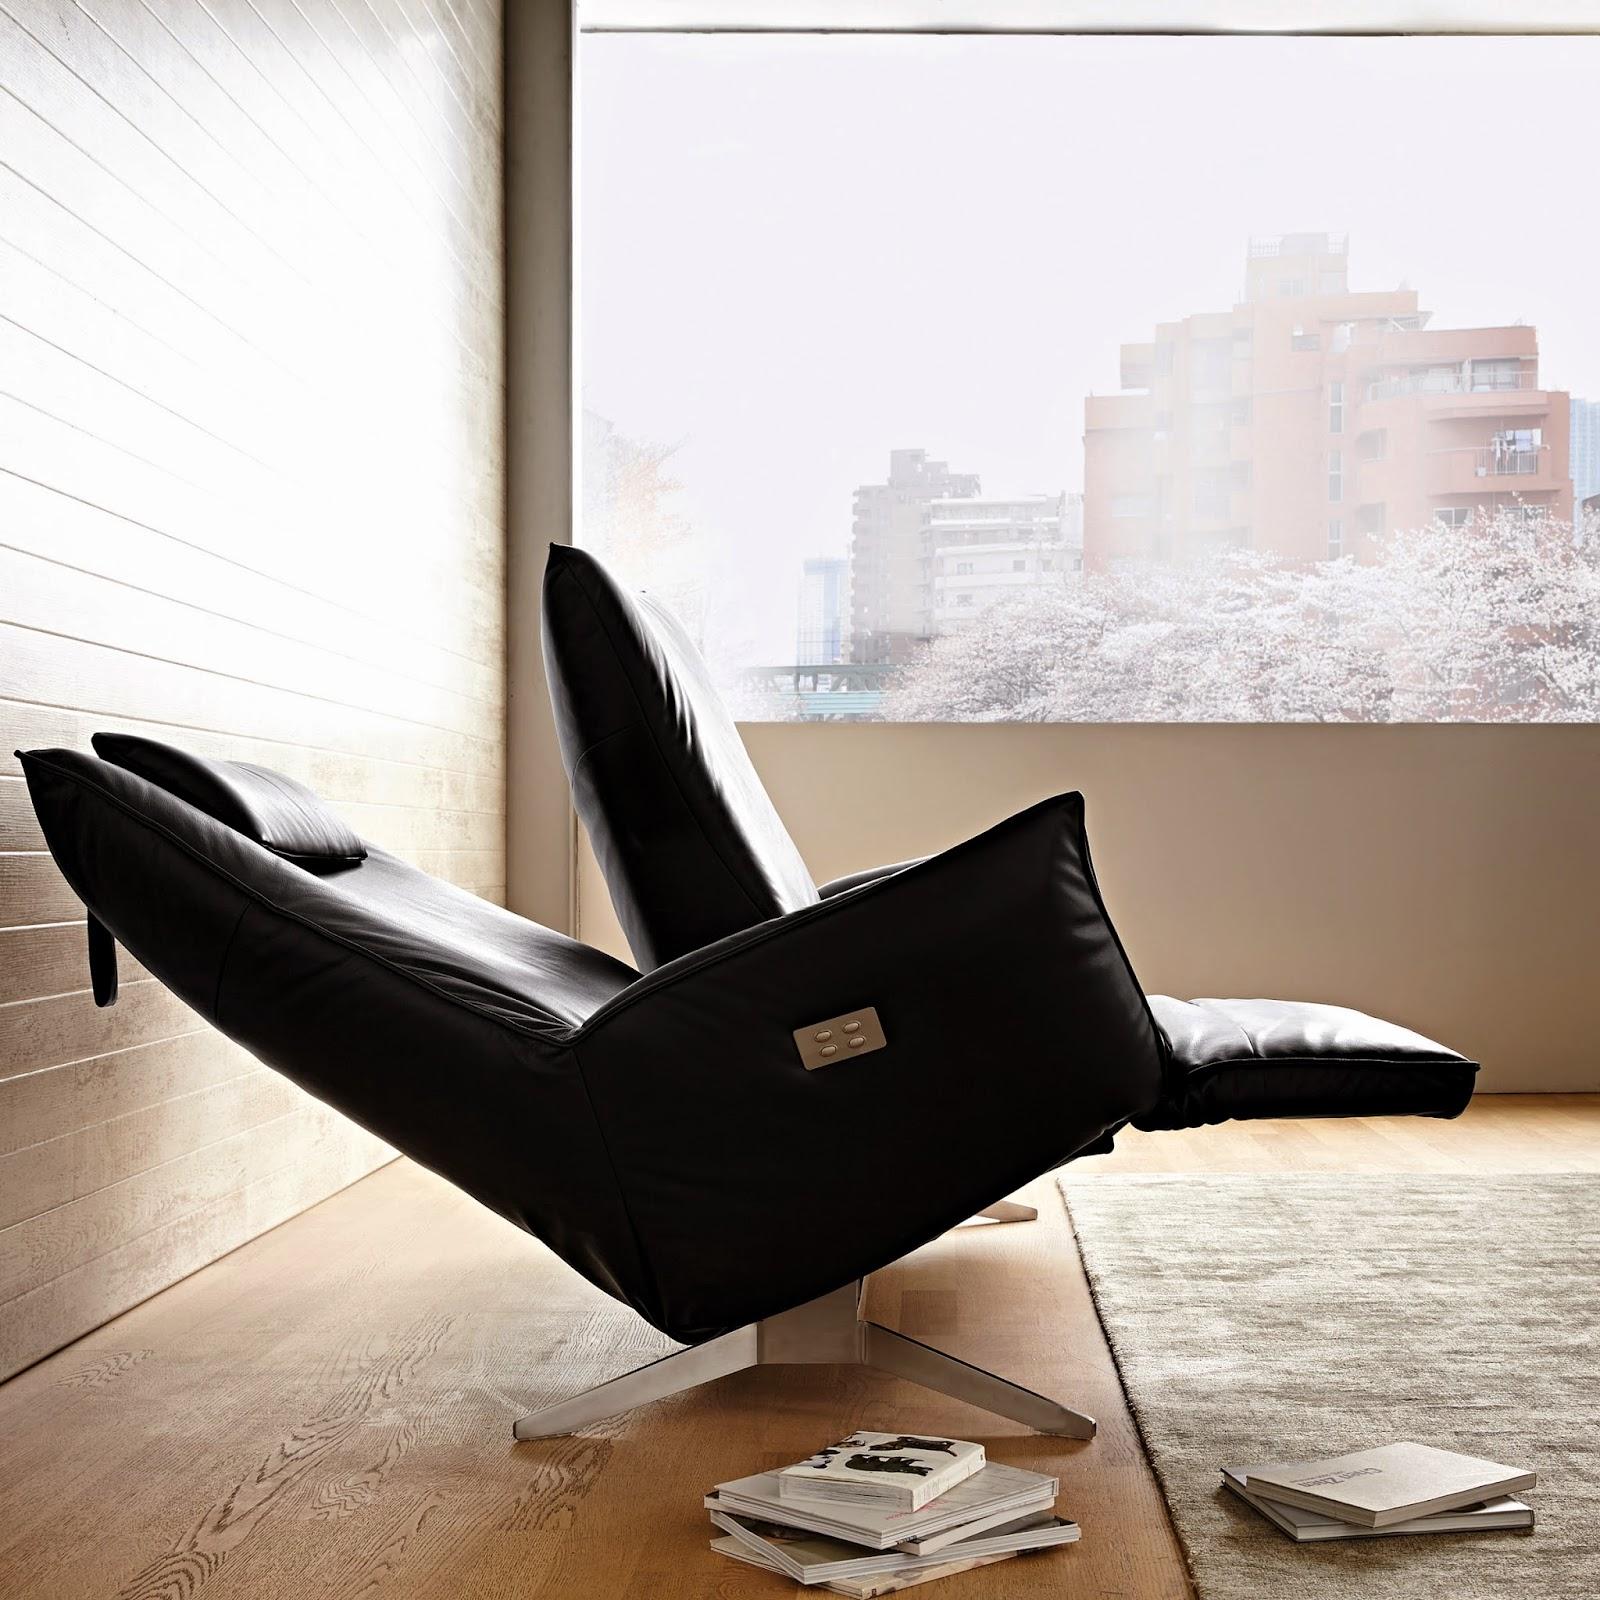 design sofa evita van koinor noordkaap meubelen. Black Bedroom Furniture Sets. Home Design Ideas